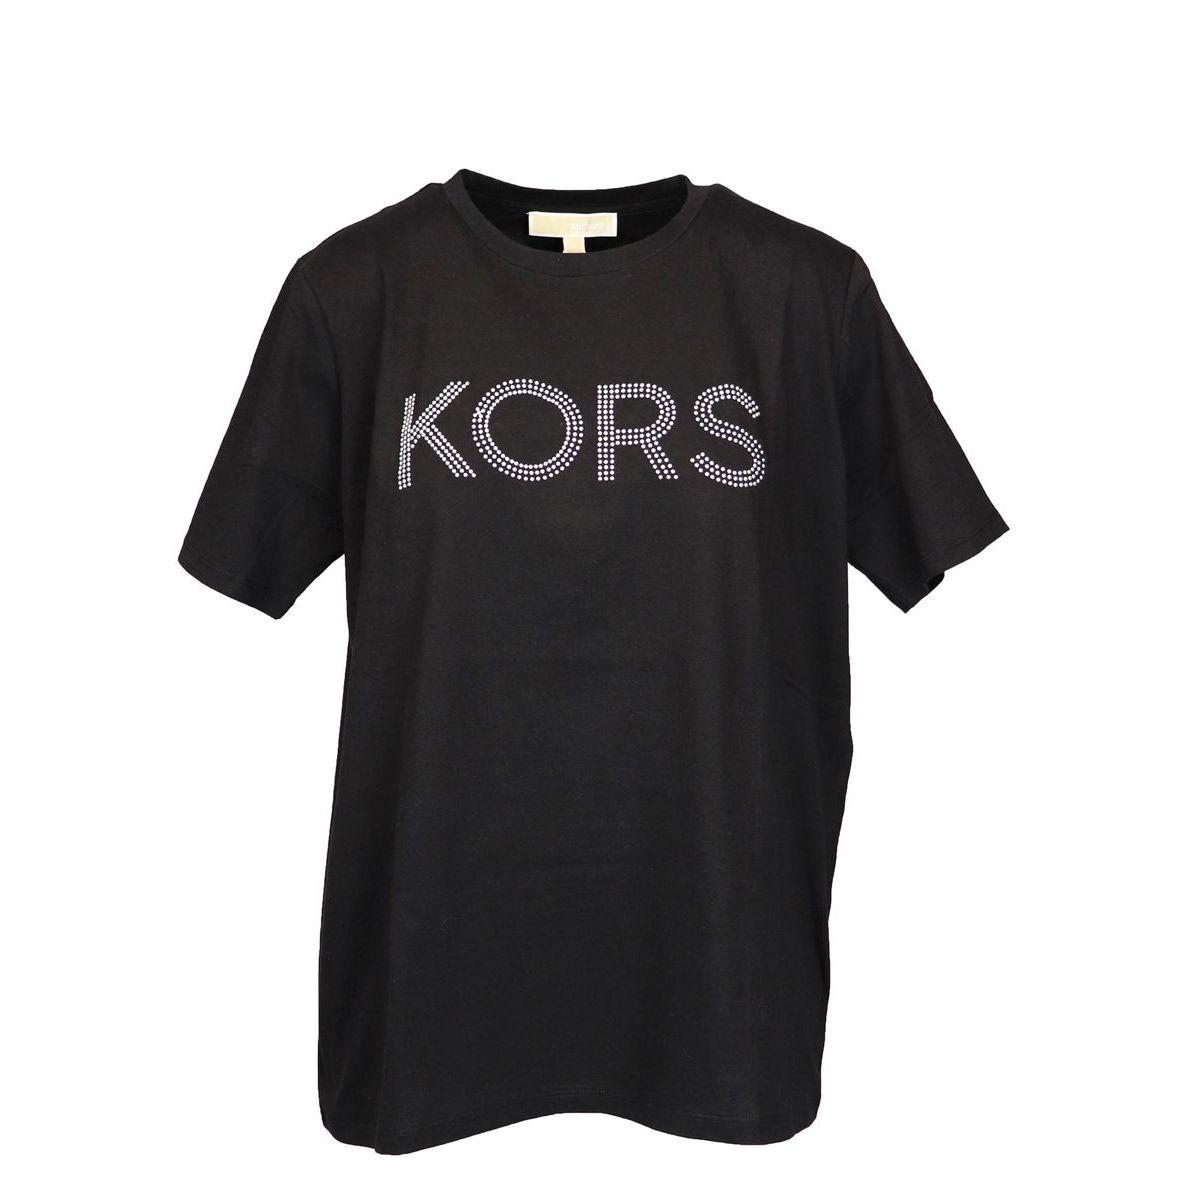 Crewneck cotton t-shirt with contrast logo Black Michael Kors